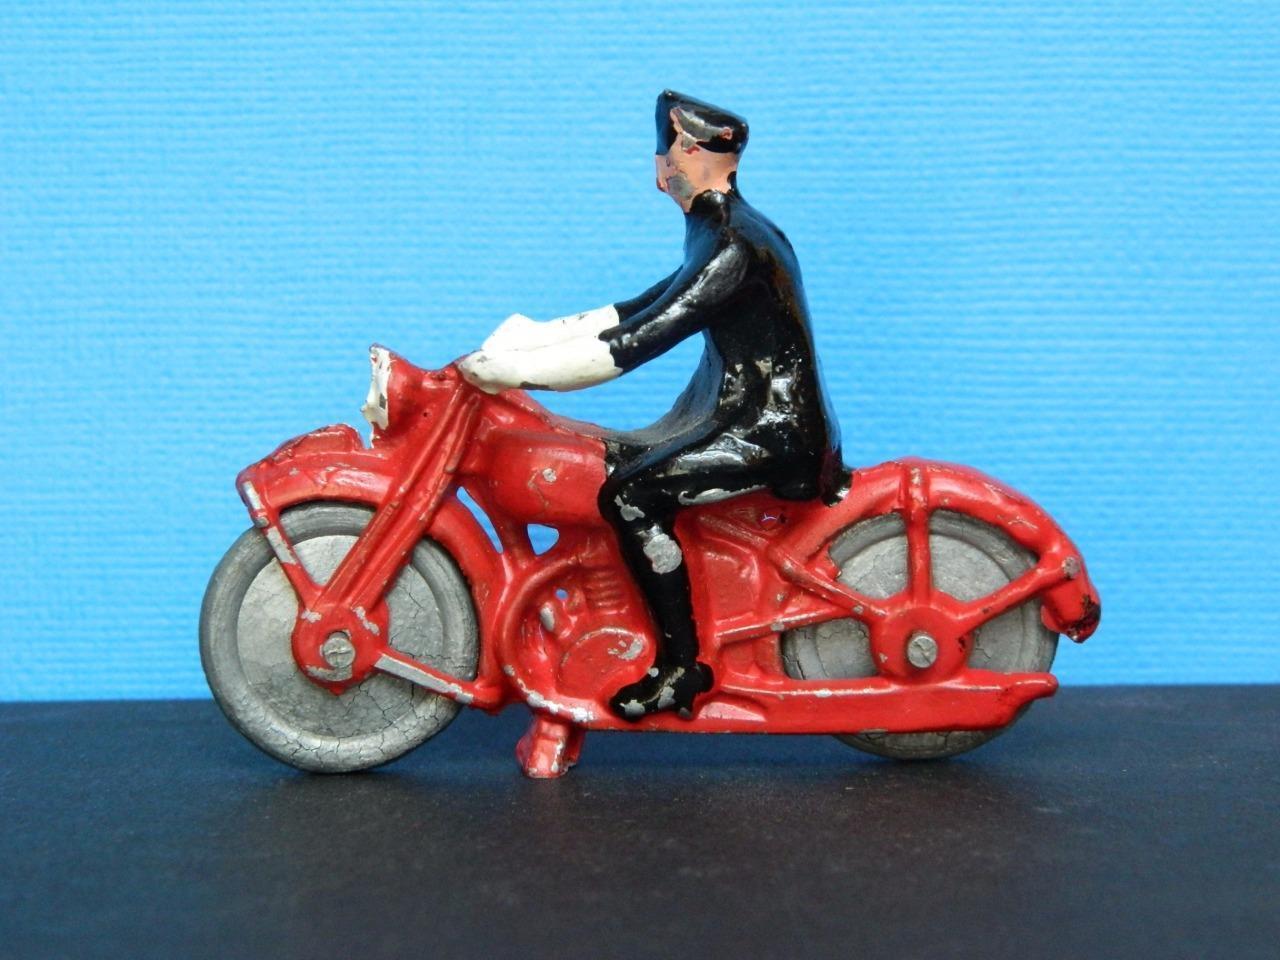 RARE BHL BRITISH HOME LIFE VINTAGE 1945-50 DIECAST POLICE MOTORCYCLE RIDER